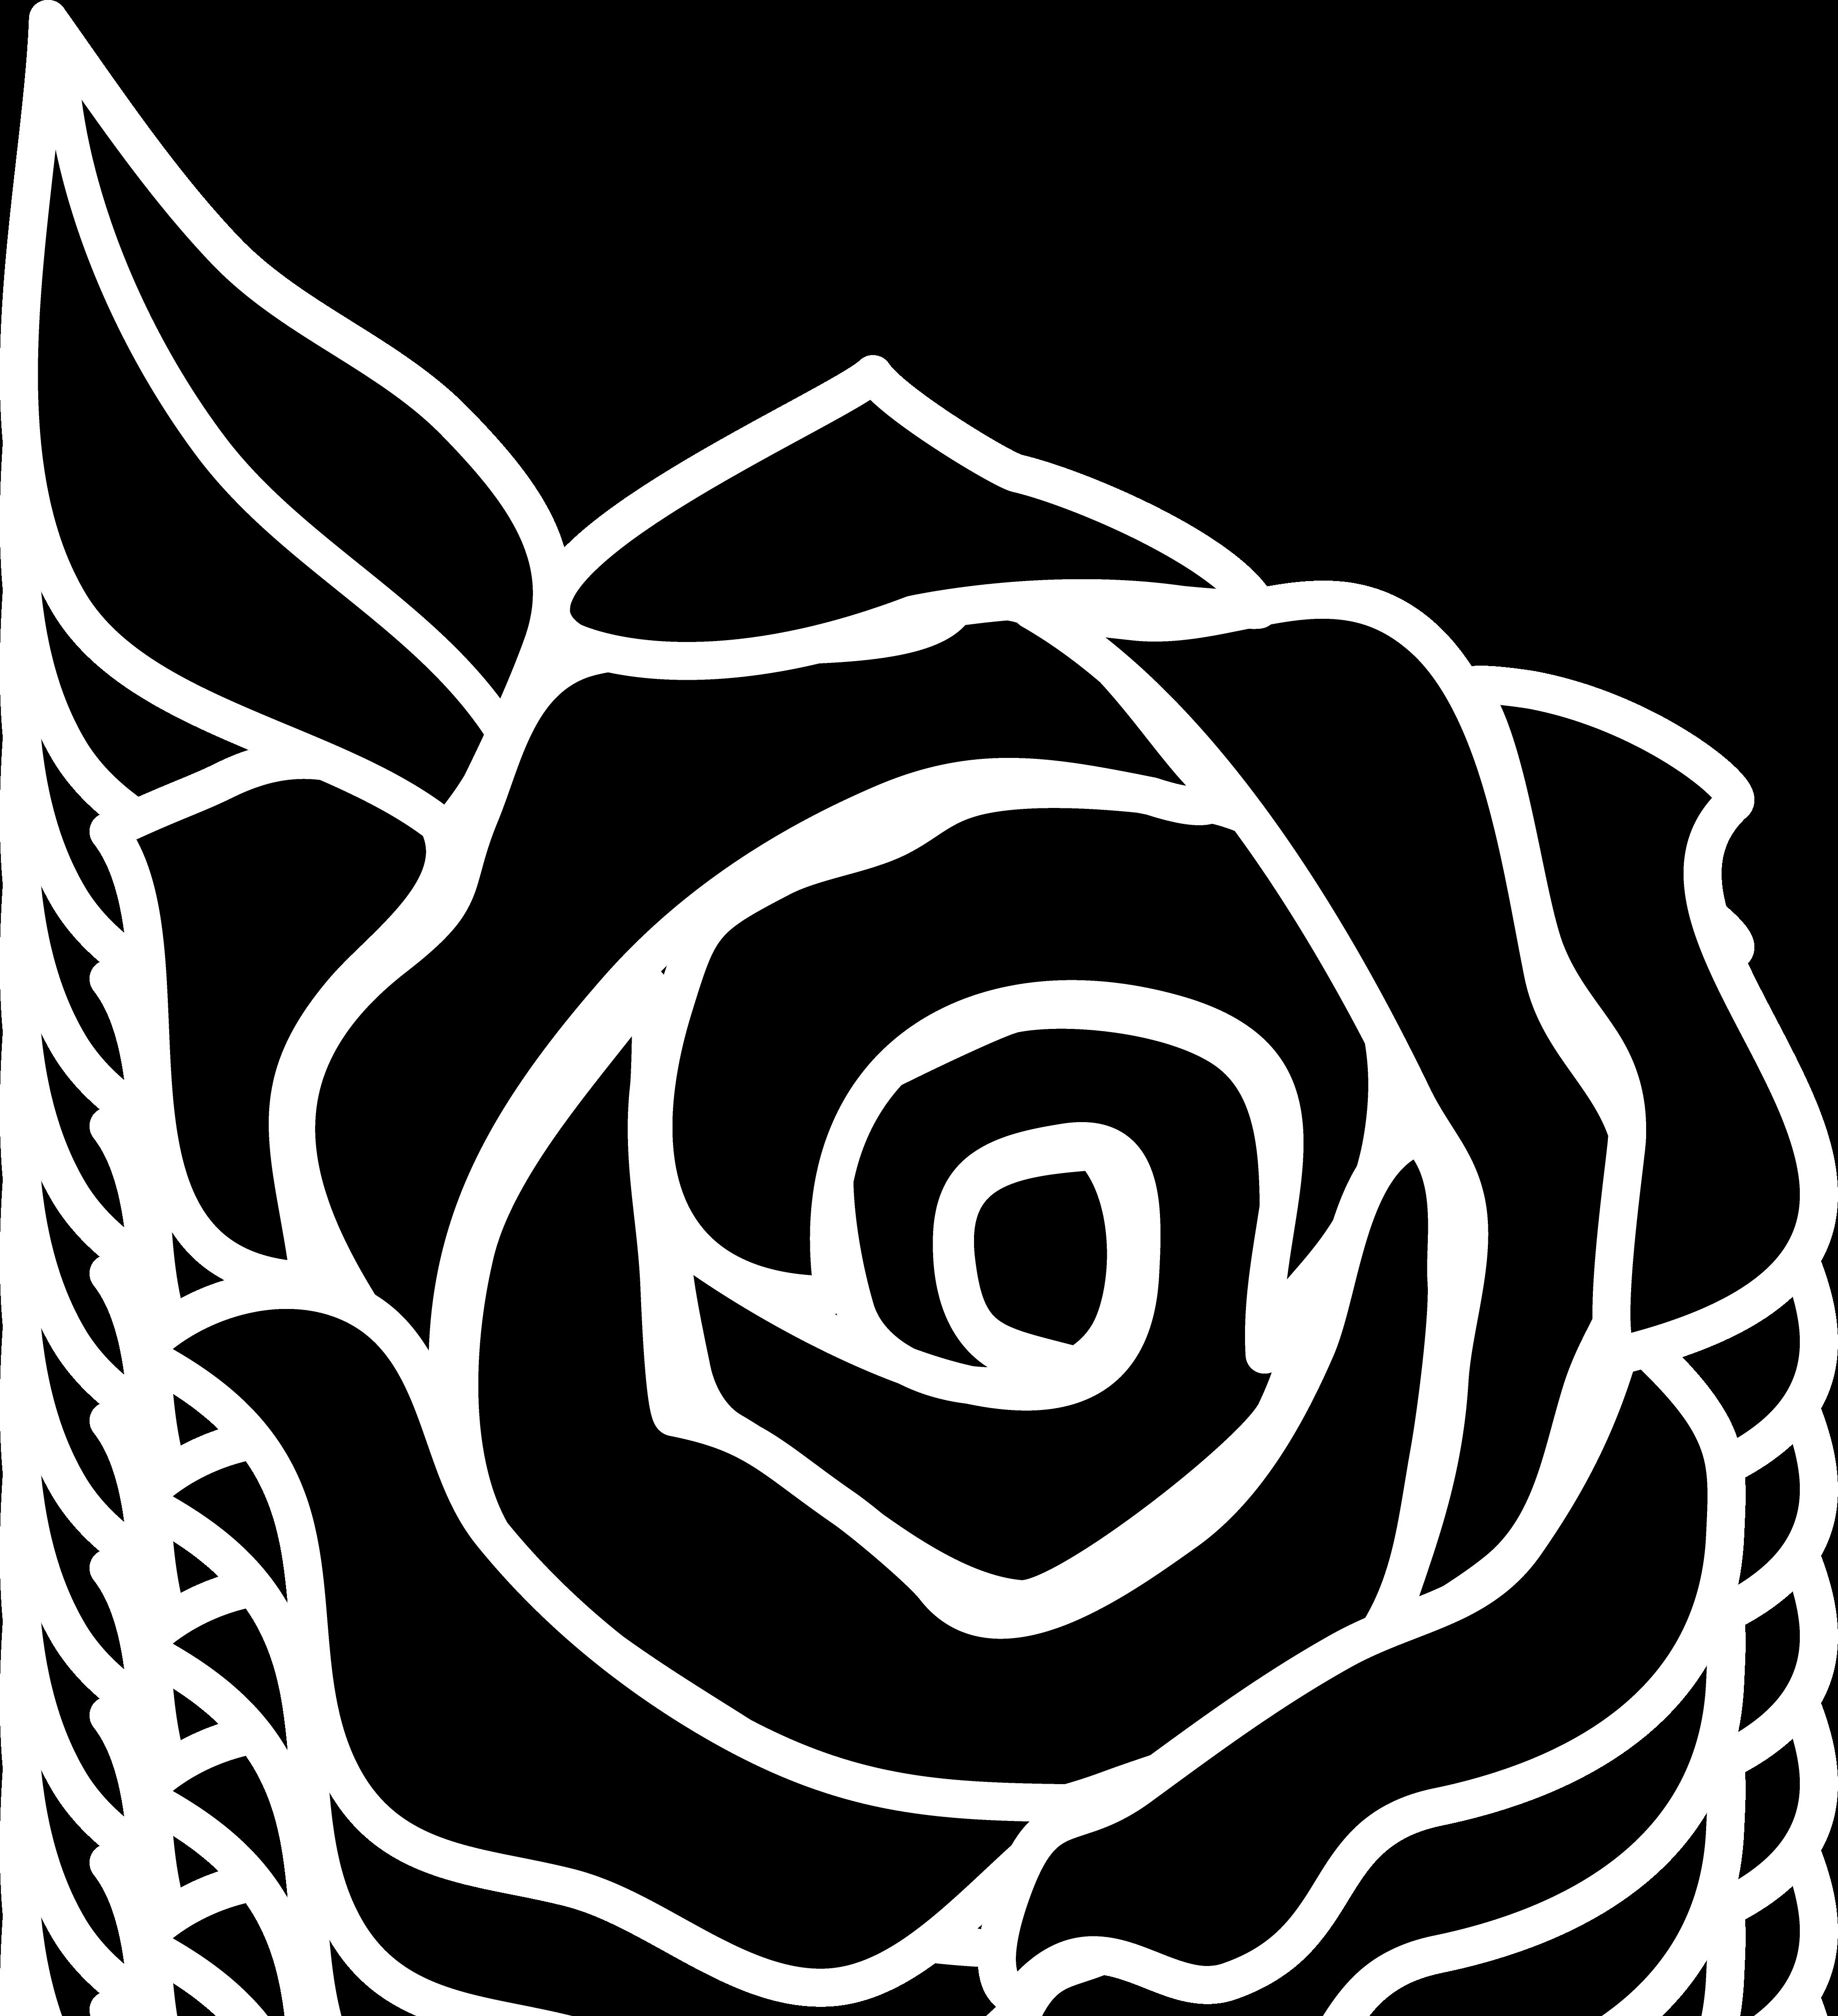 Rose Black And White Black And White Ima-Rose black and white black and white images of roses clipart-10